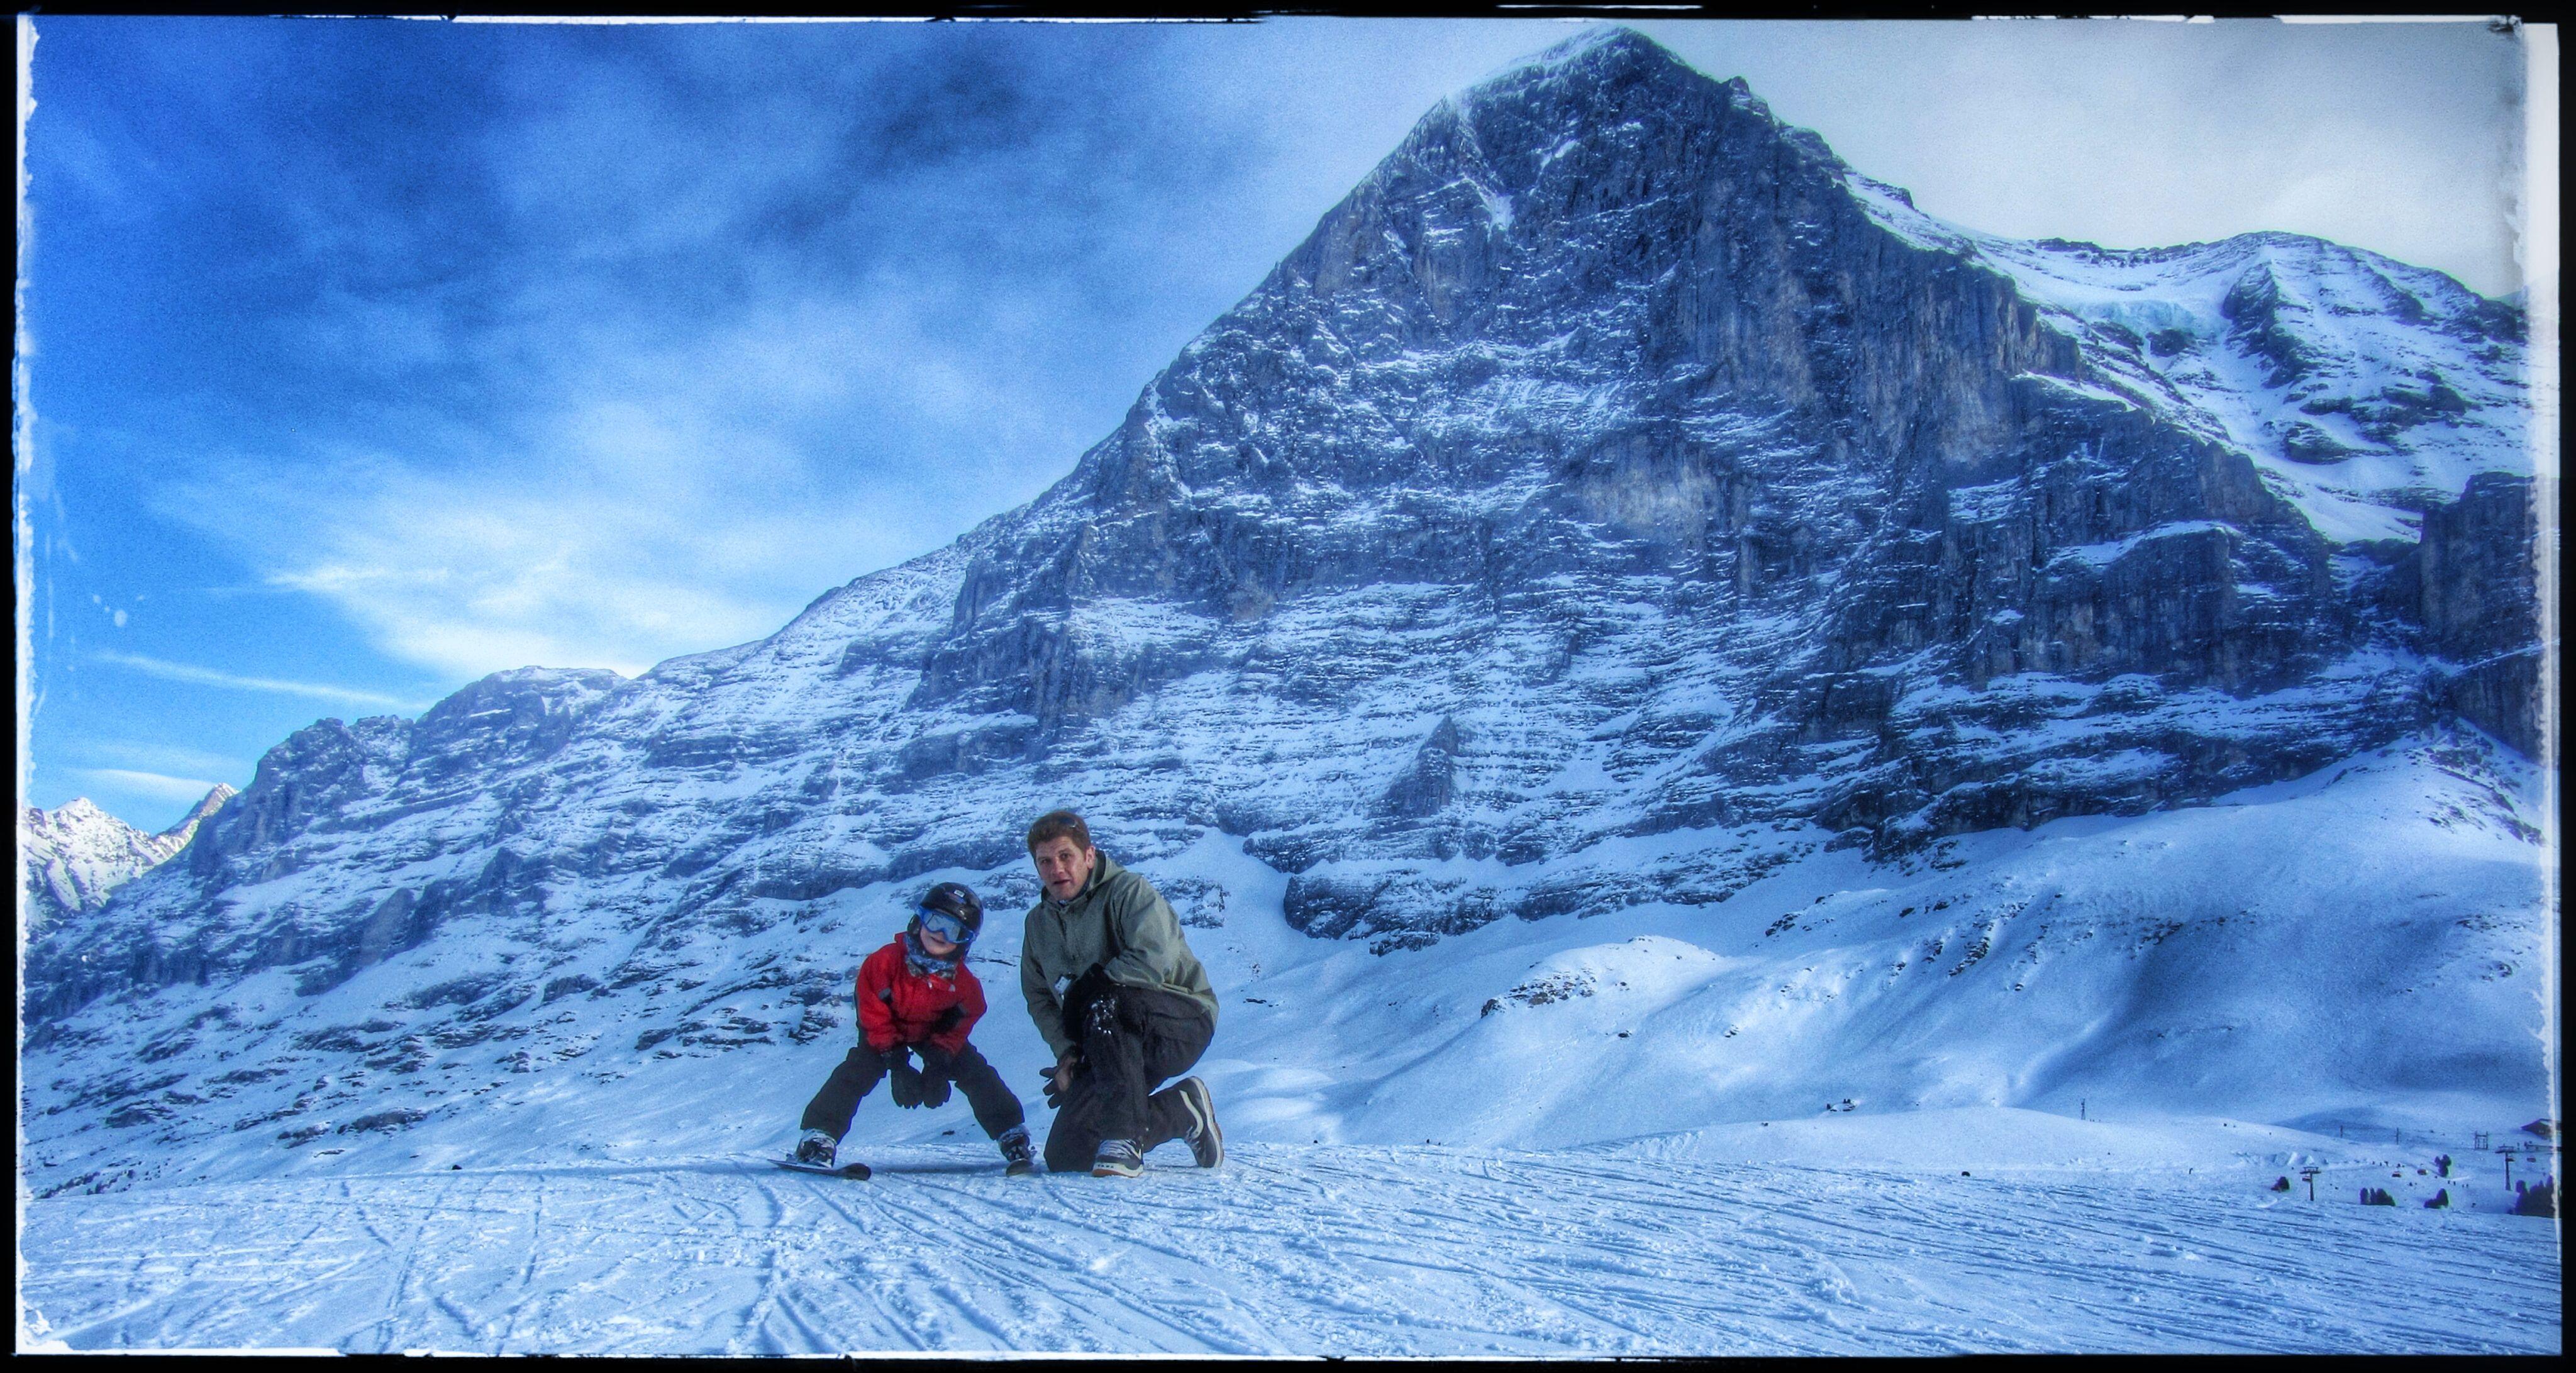 More family ski trips